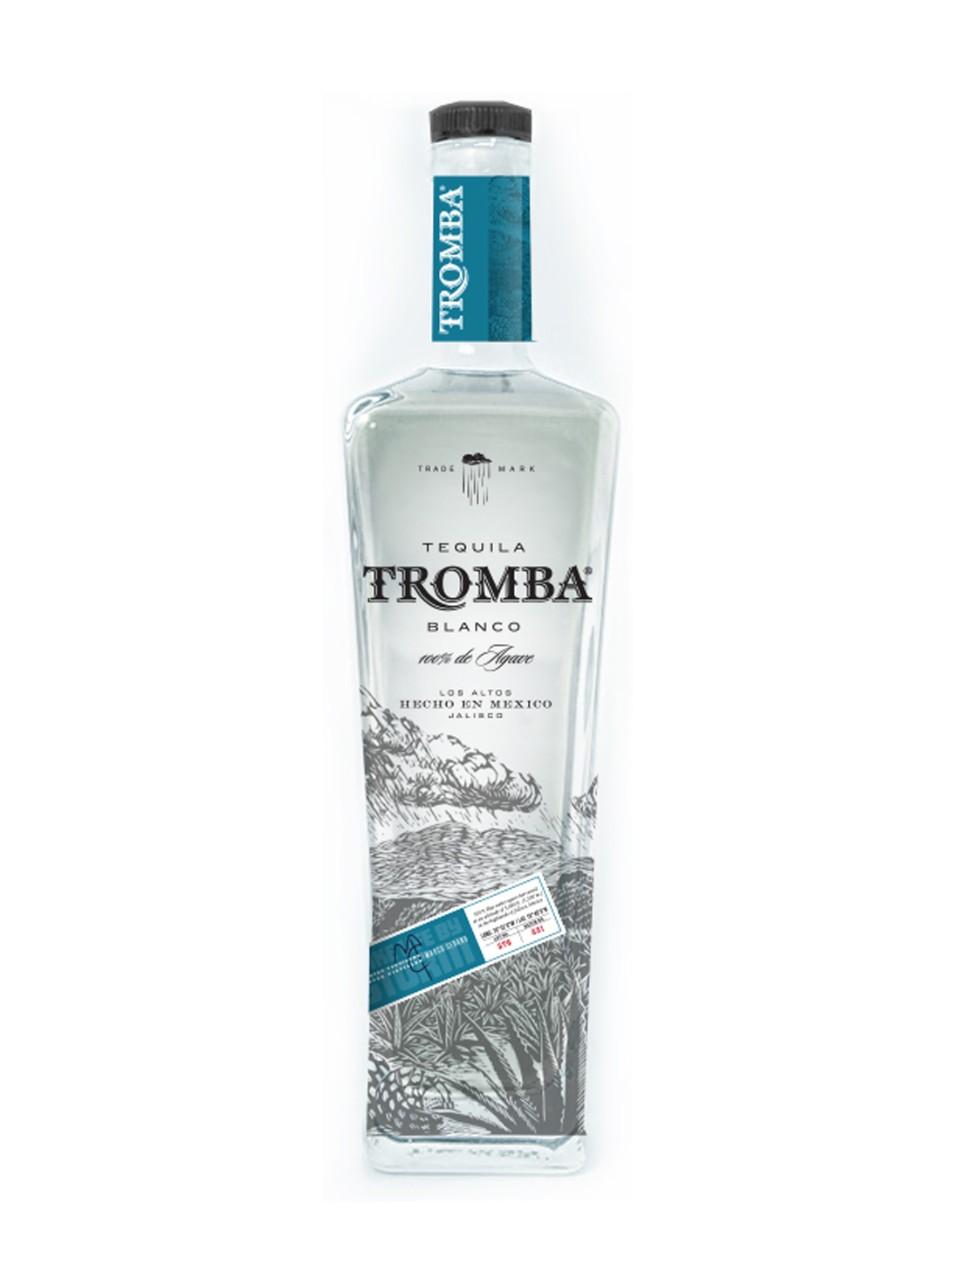 Tequila tromba blanco lcbo - Banco blanco ...